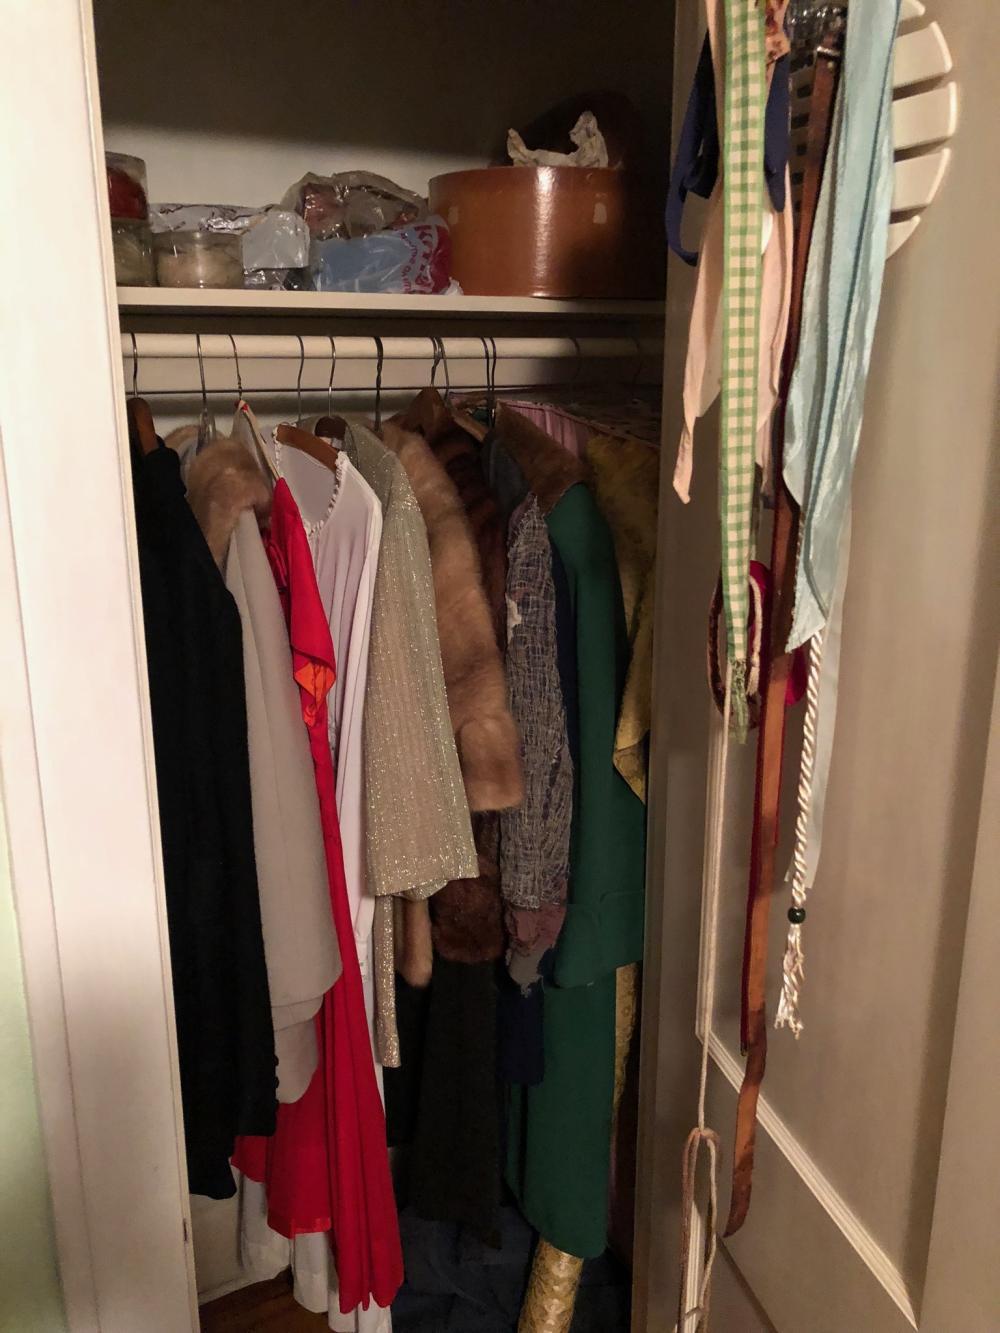 Vintage Cloths, Closet and Cedar Chest